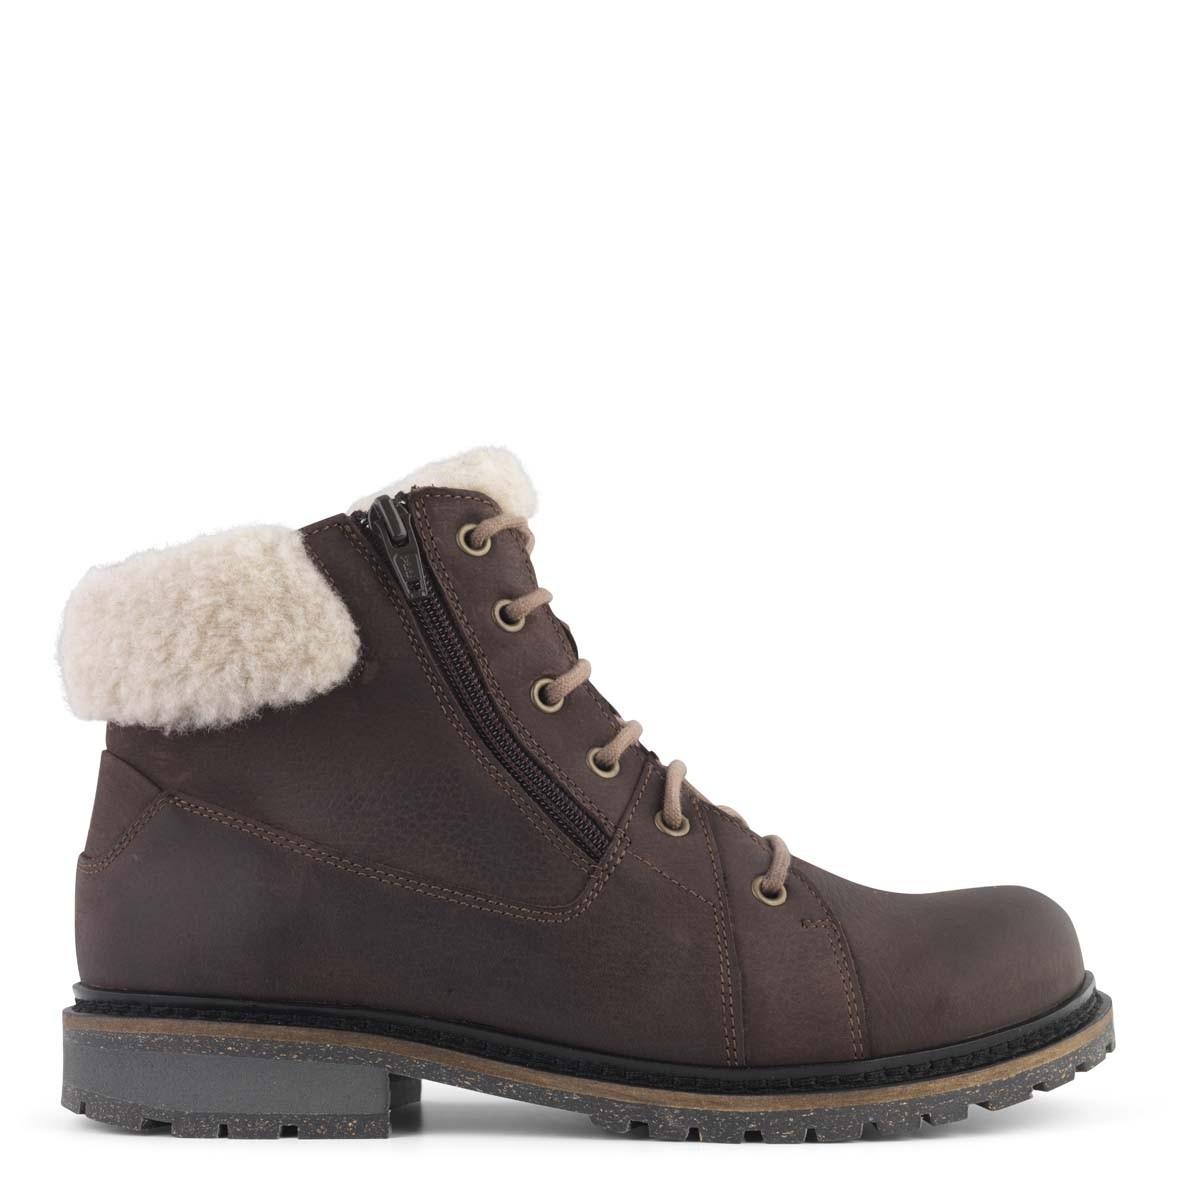 New Feet varm støvle i brun kalveskind